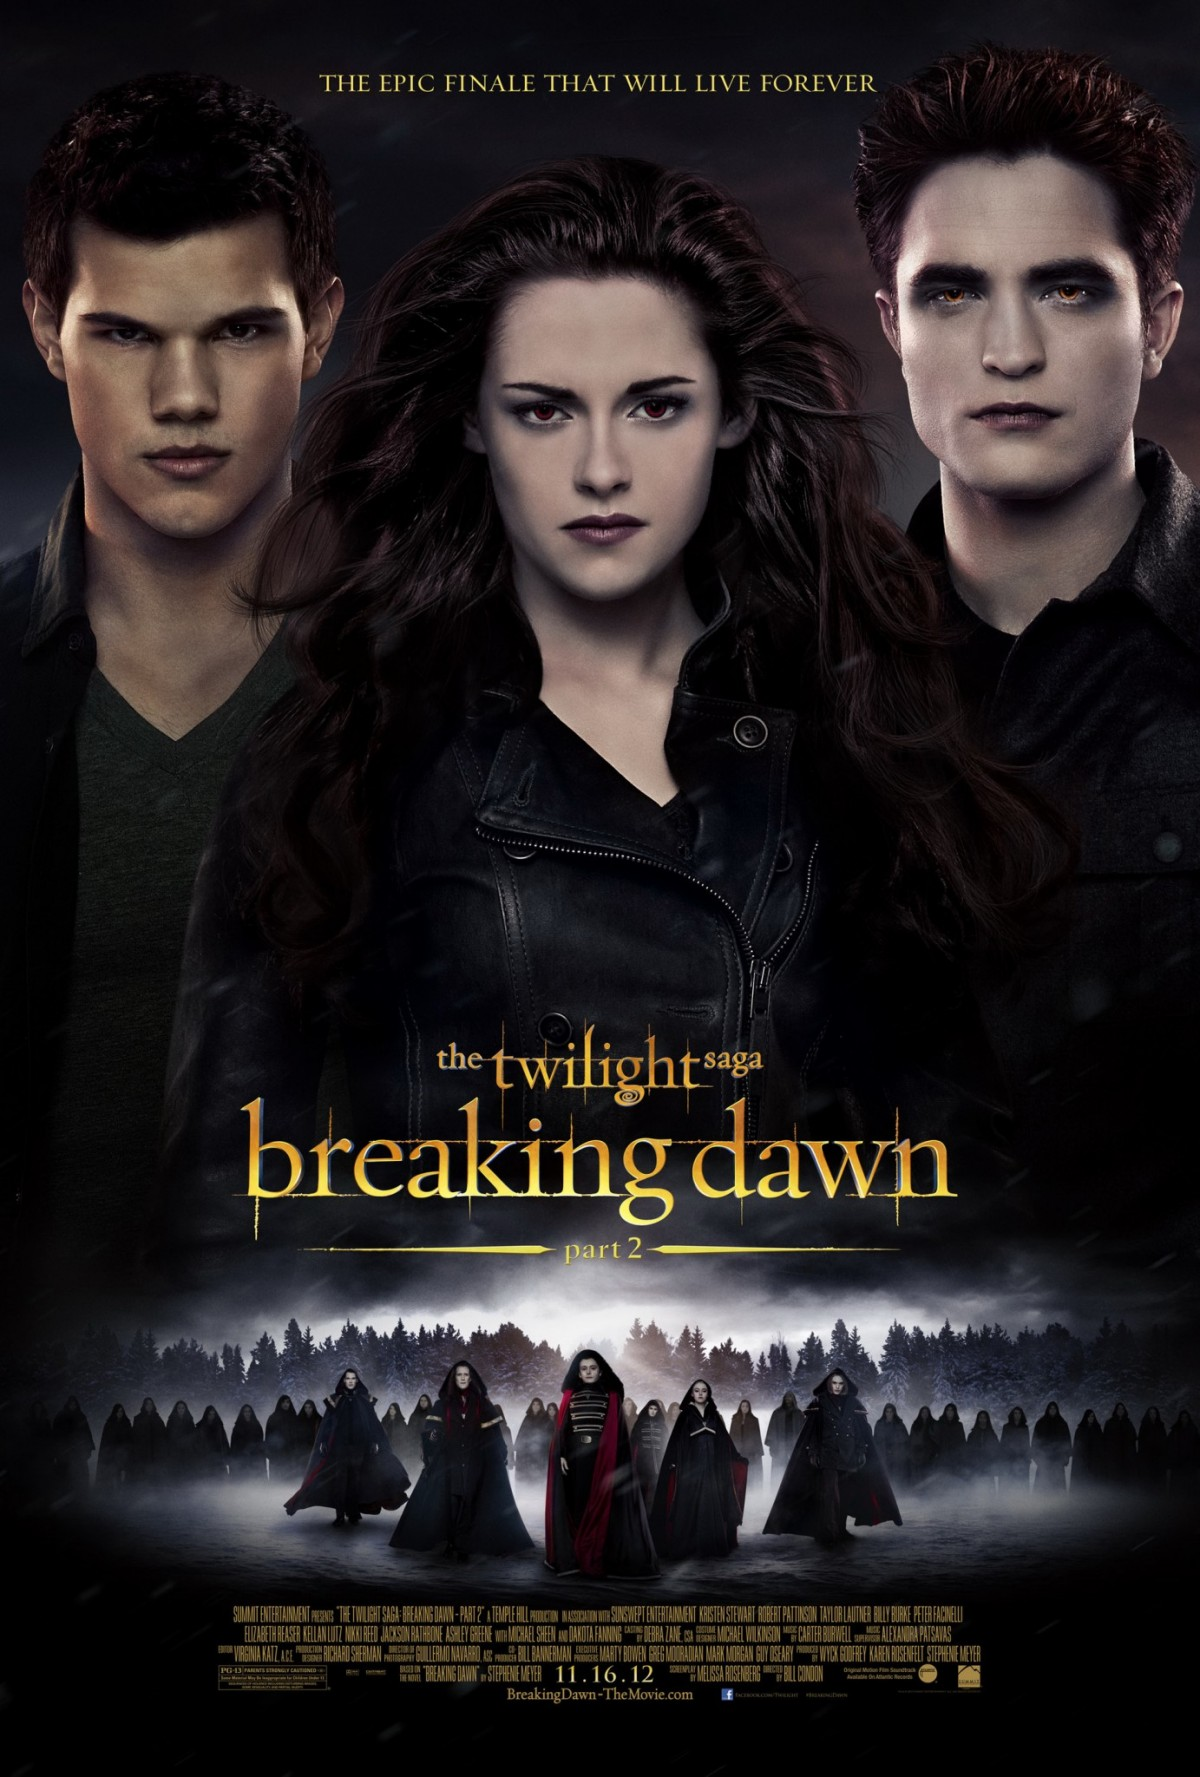 Twilight Saga, The - Breaking Dawn - Part 2